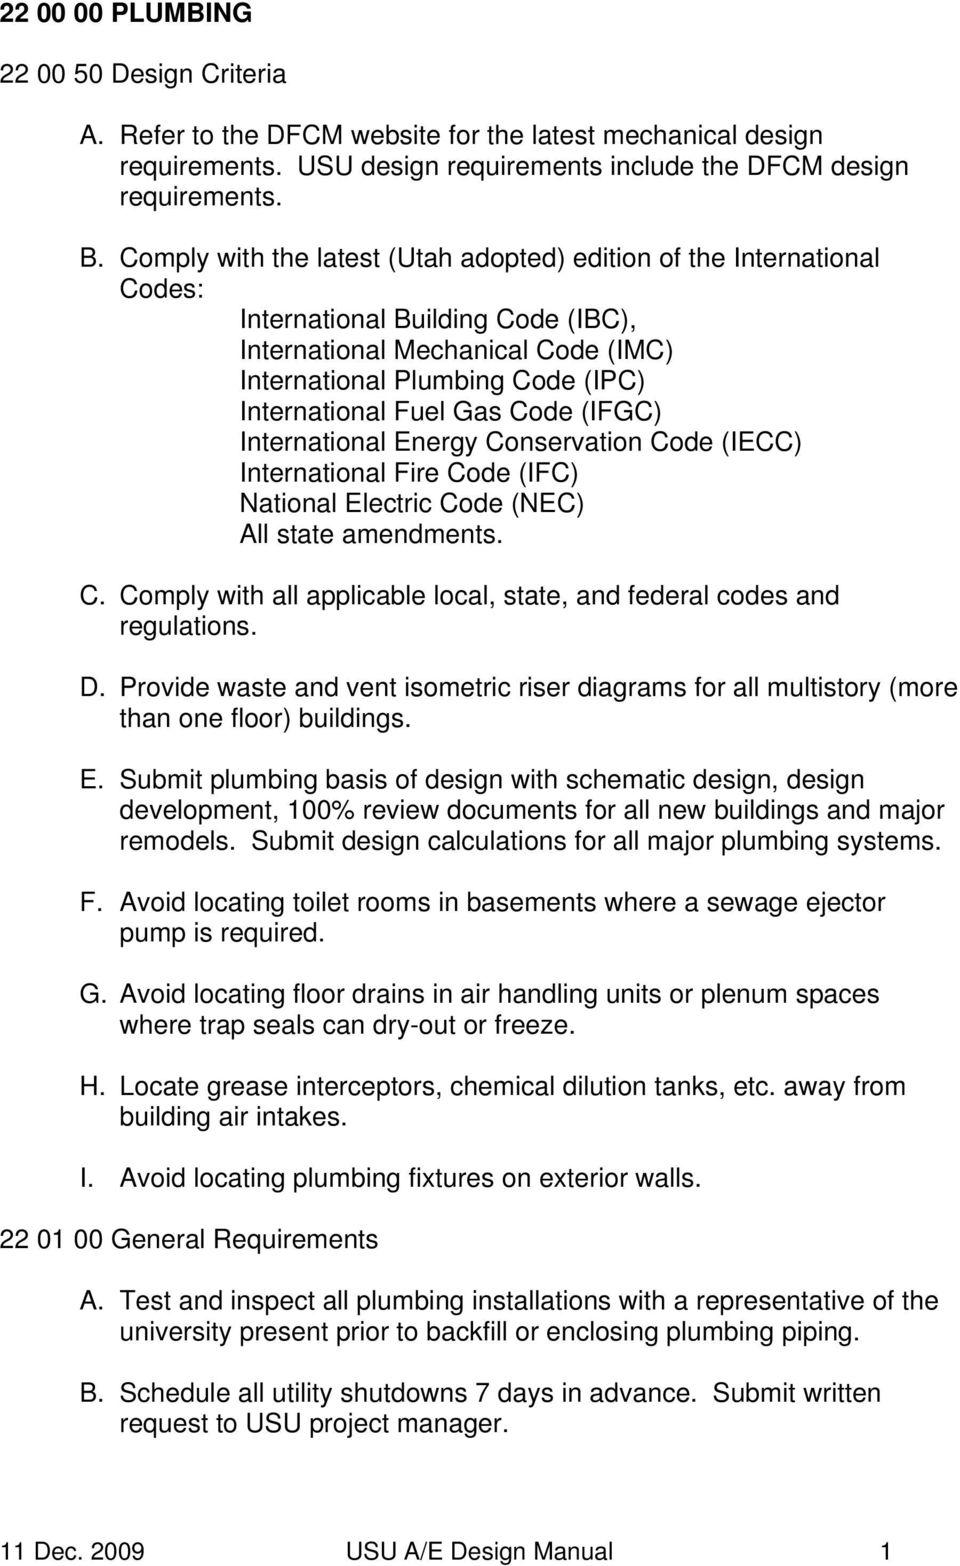 medium resolution of gas code ifgc international energy conservation code iecc international fire code